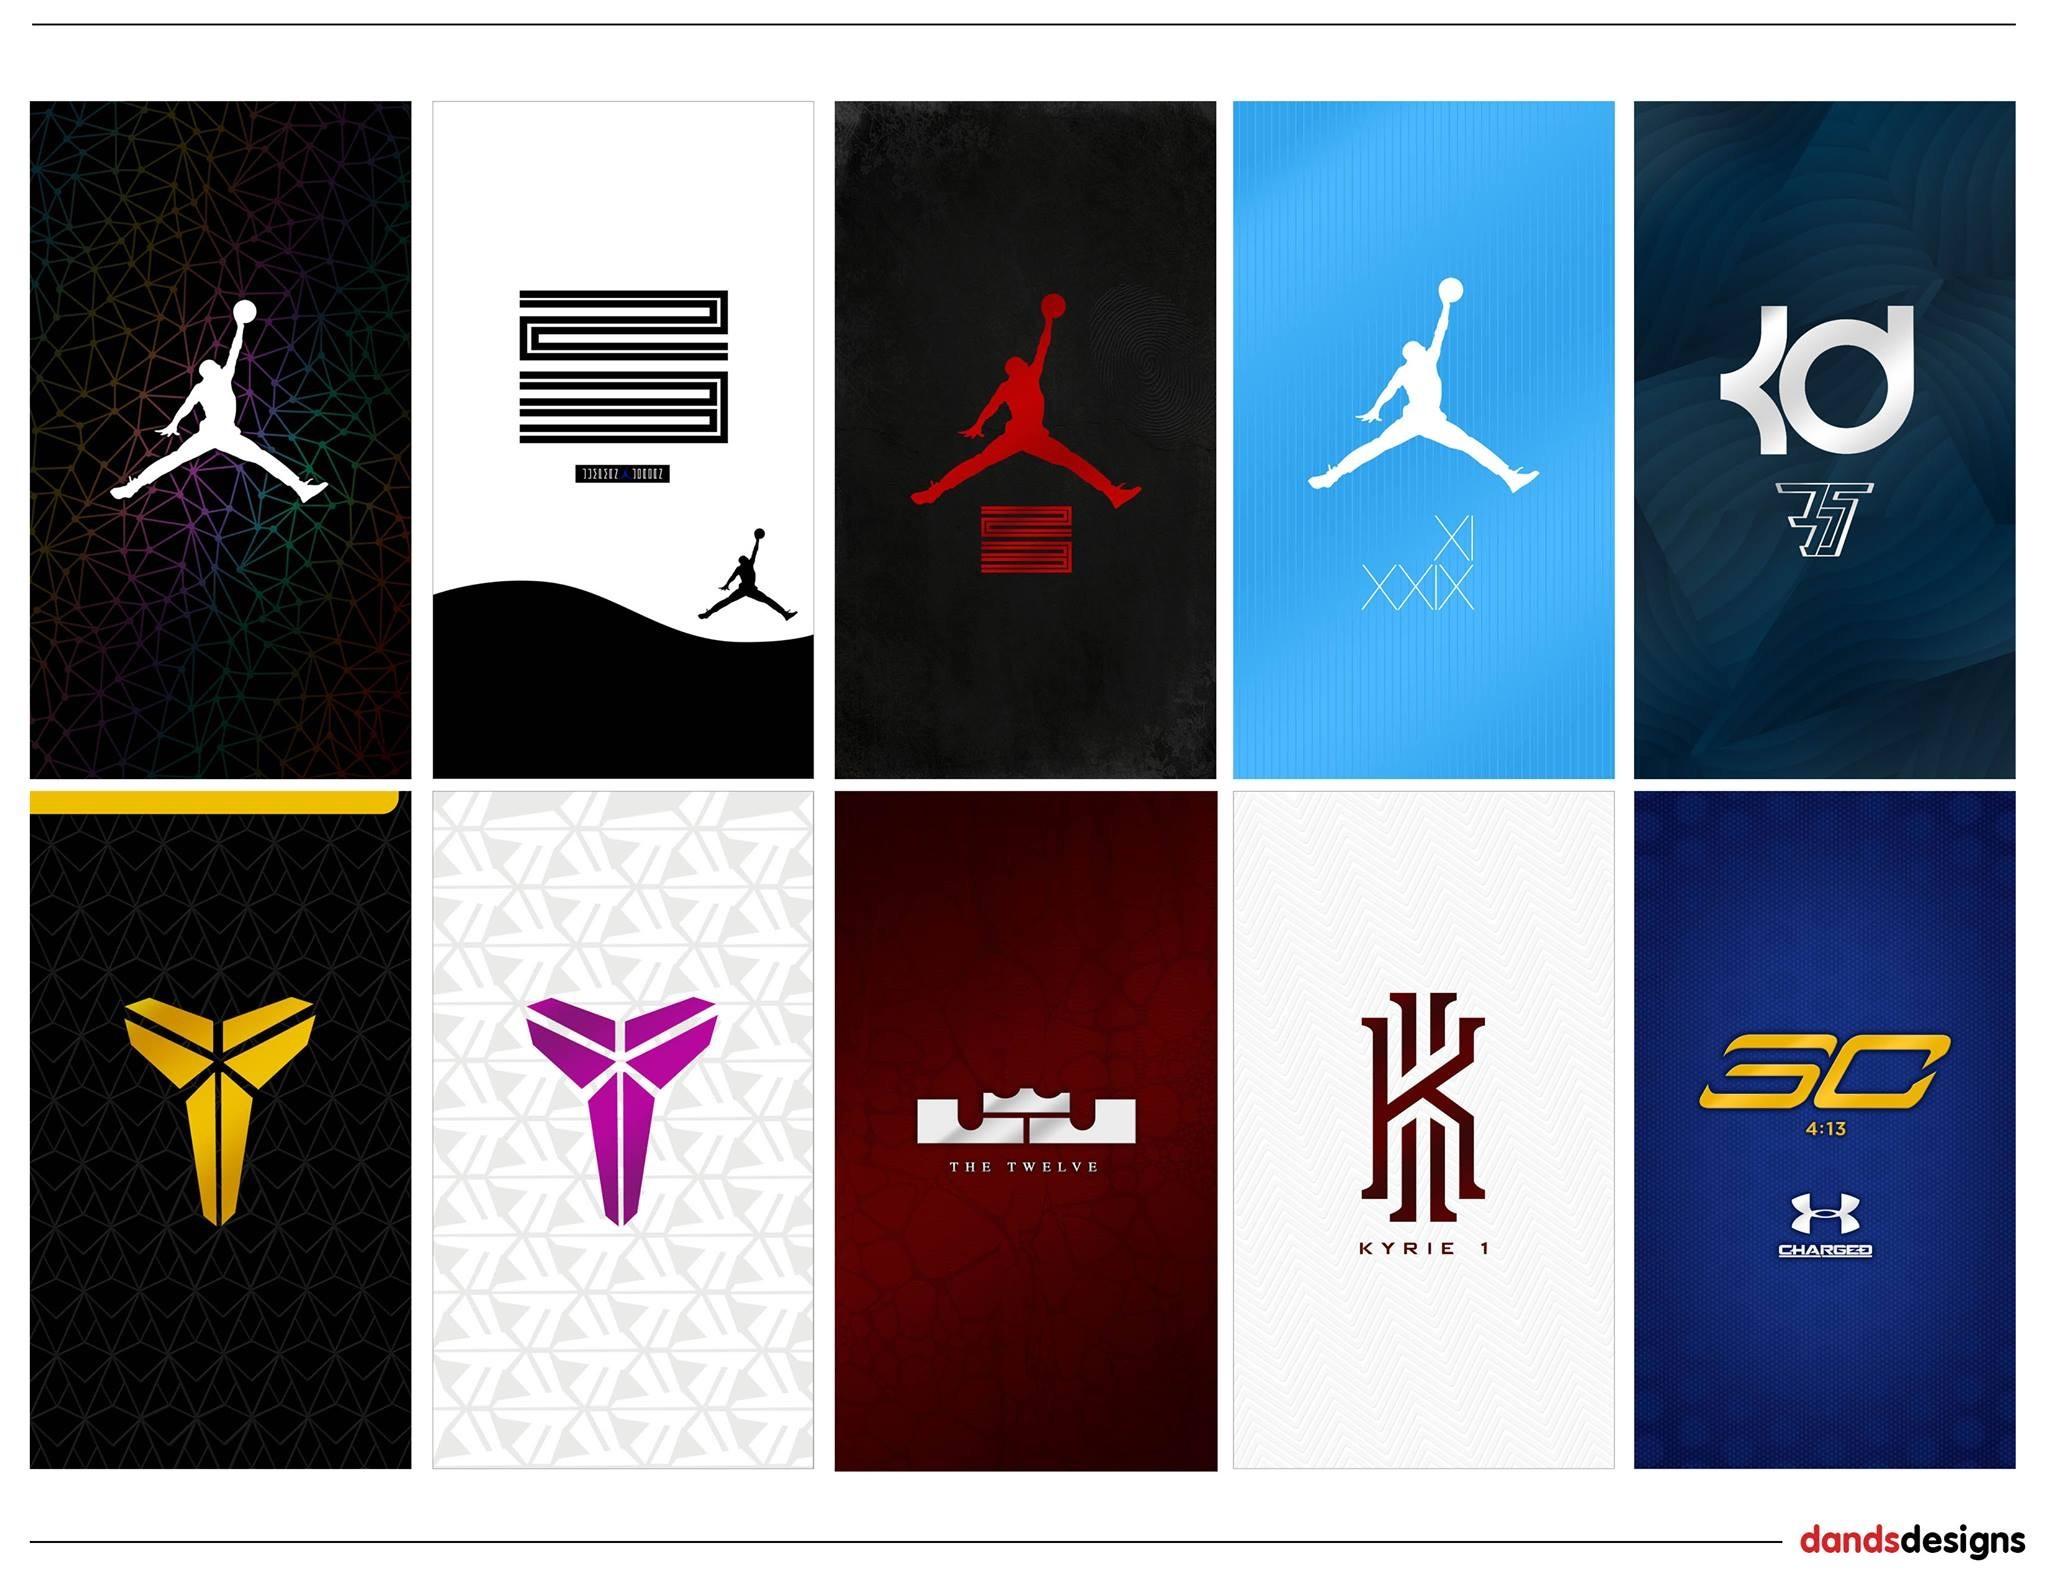 "Cool Mobile Wallpaper by DandsDesigns at Facebook ""Dands Dave Cool Wallpaper """